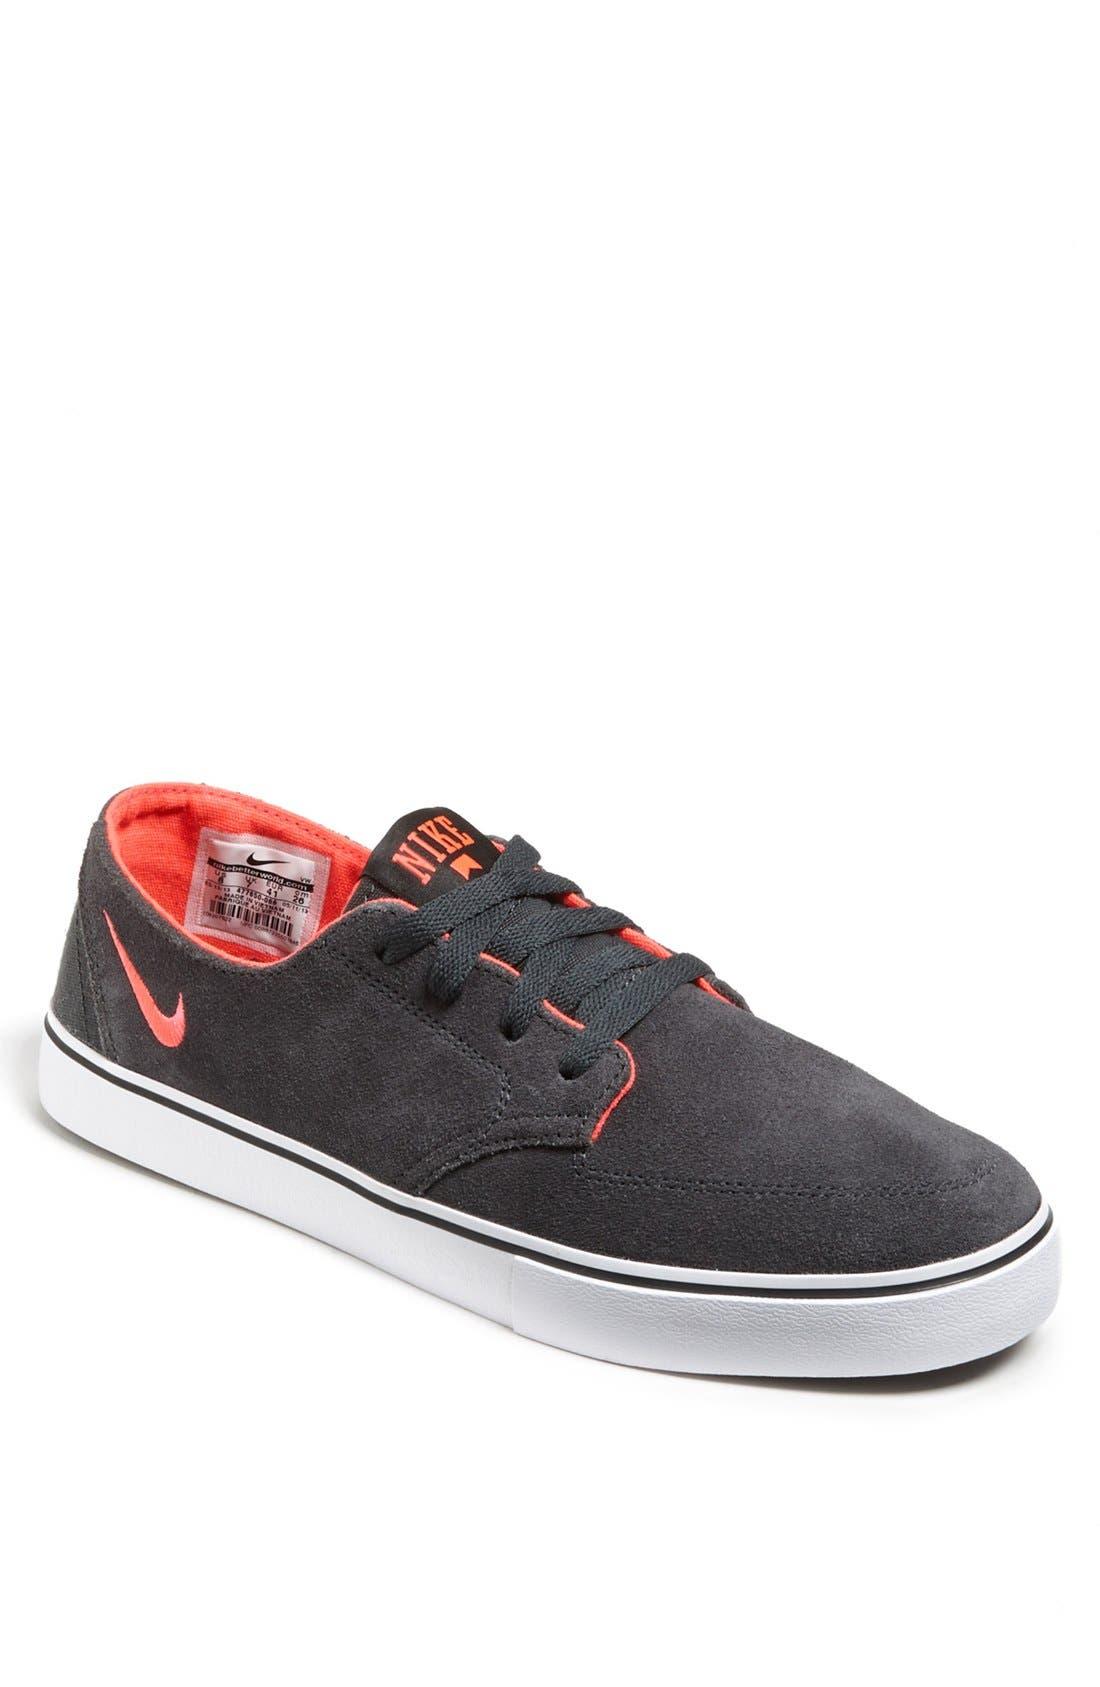 Main Image - Nike 'Braata LR' Sneaker (Men)